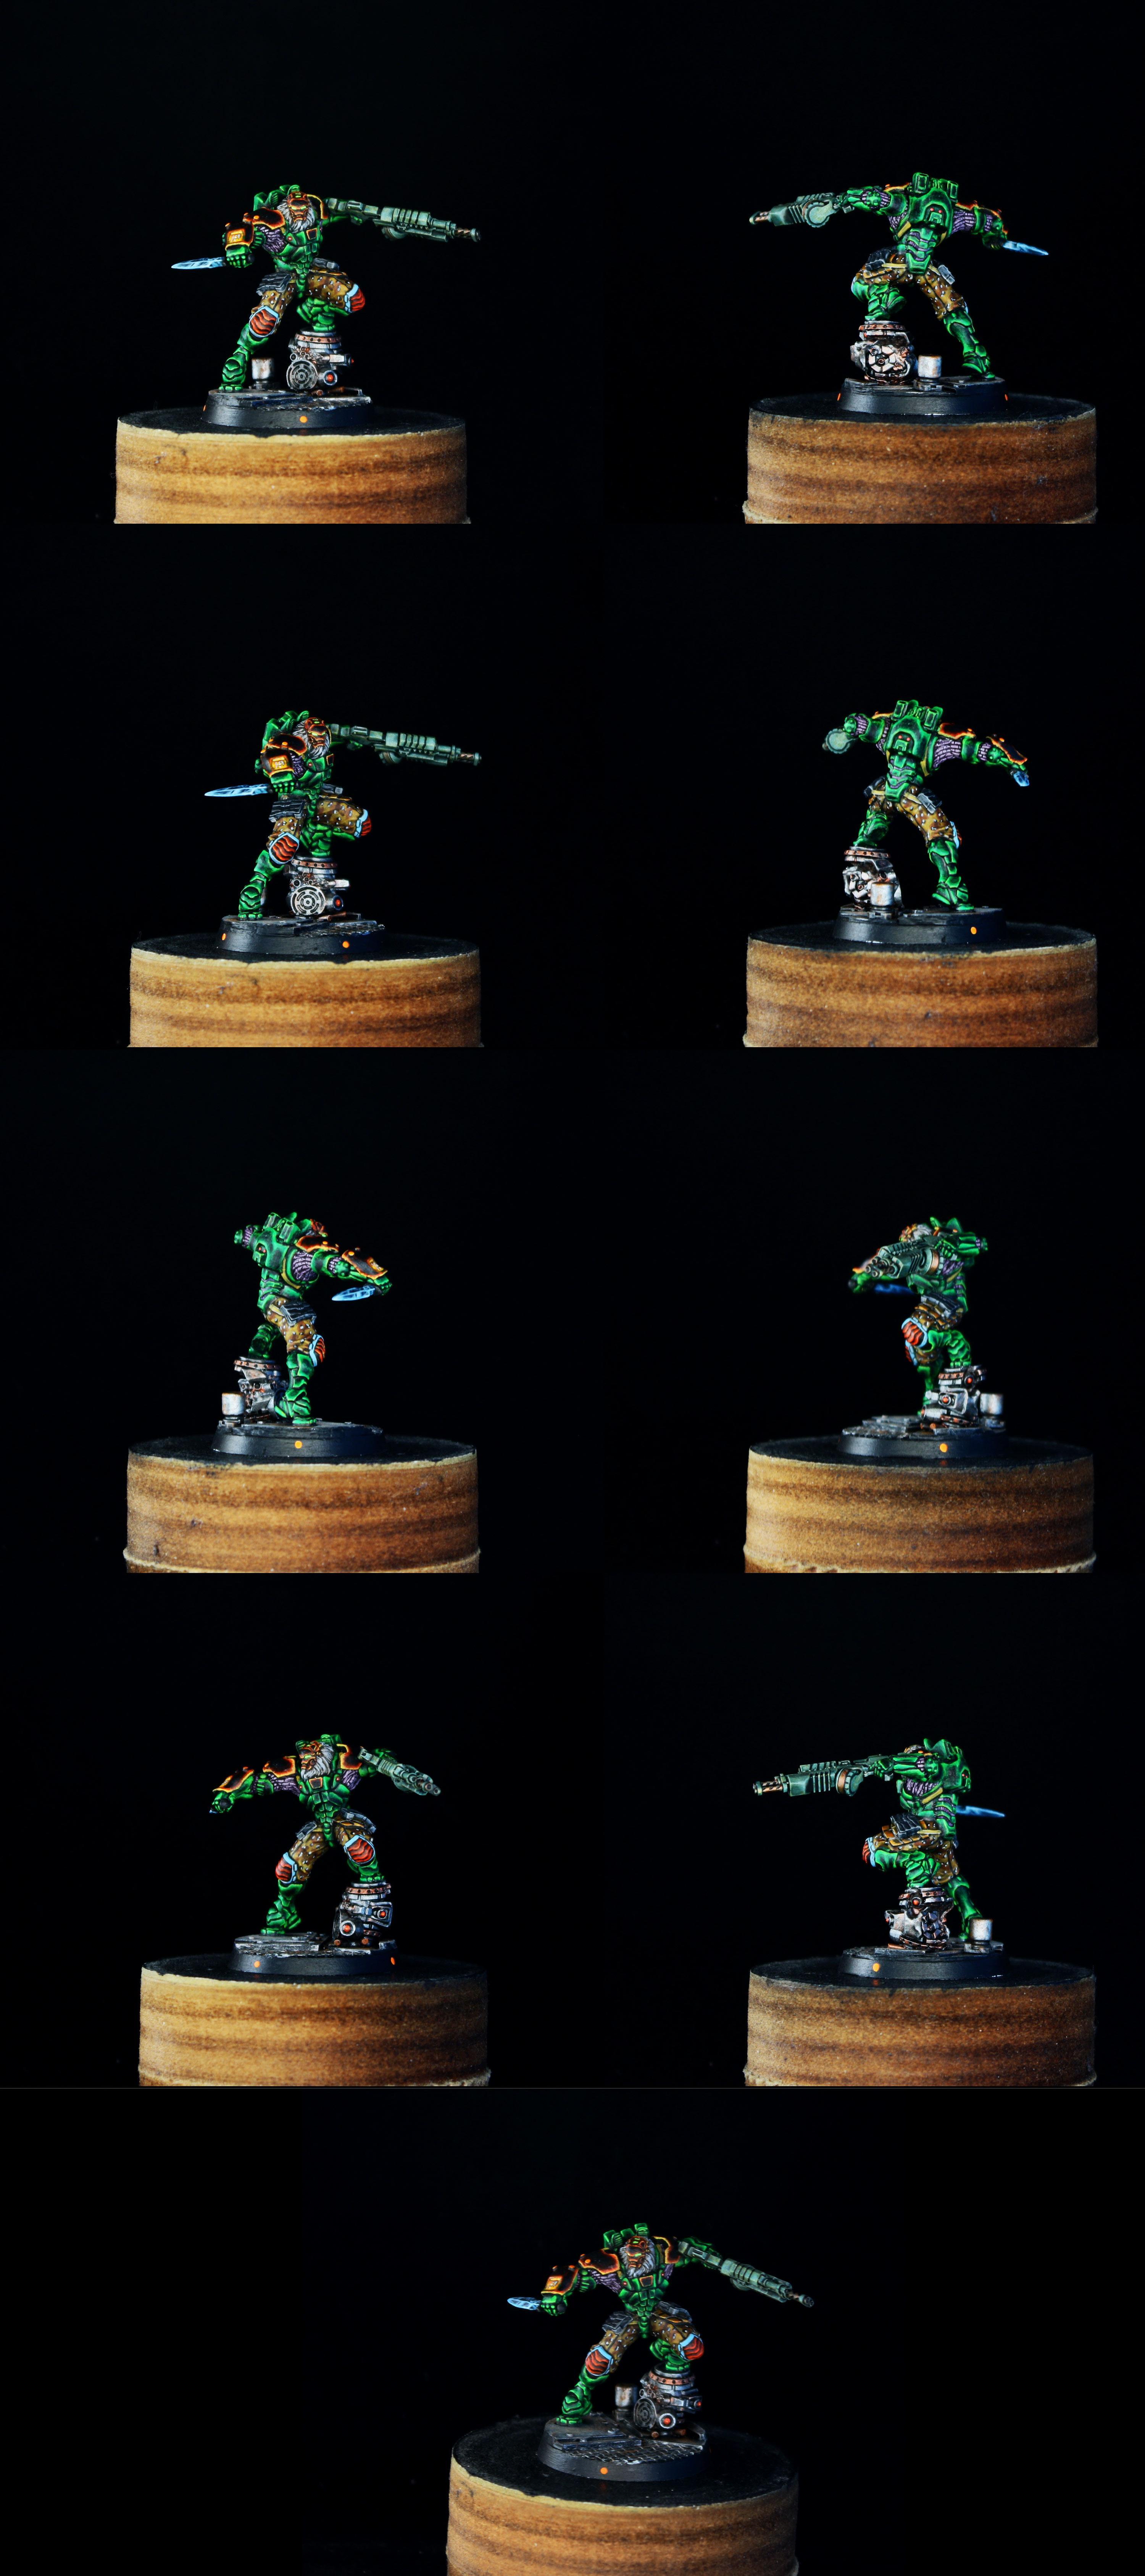 Infinity, Infinity: Combined army - Raktorak, Morat Major Sergeant (2015)